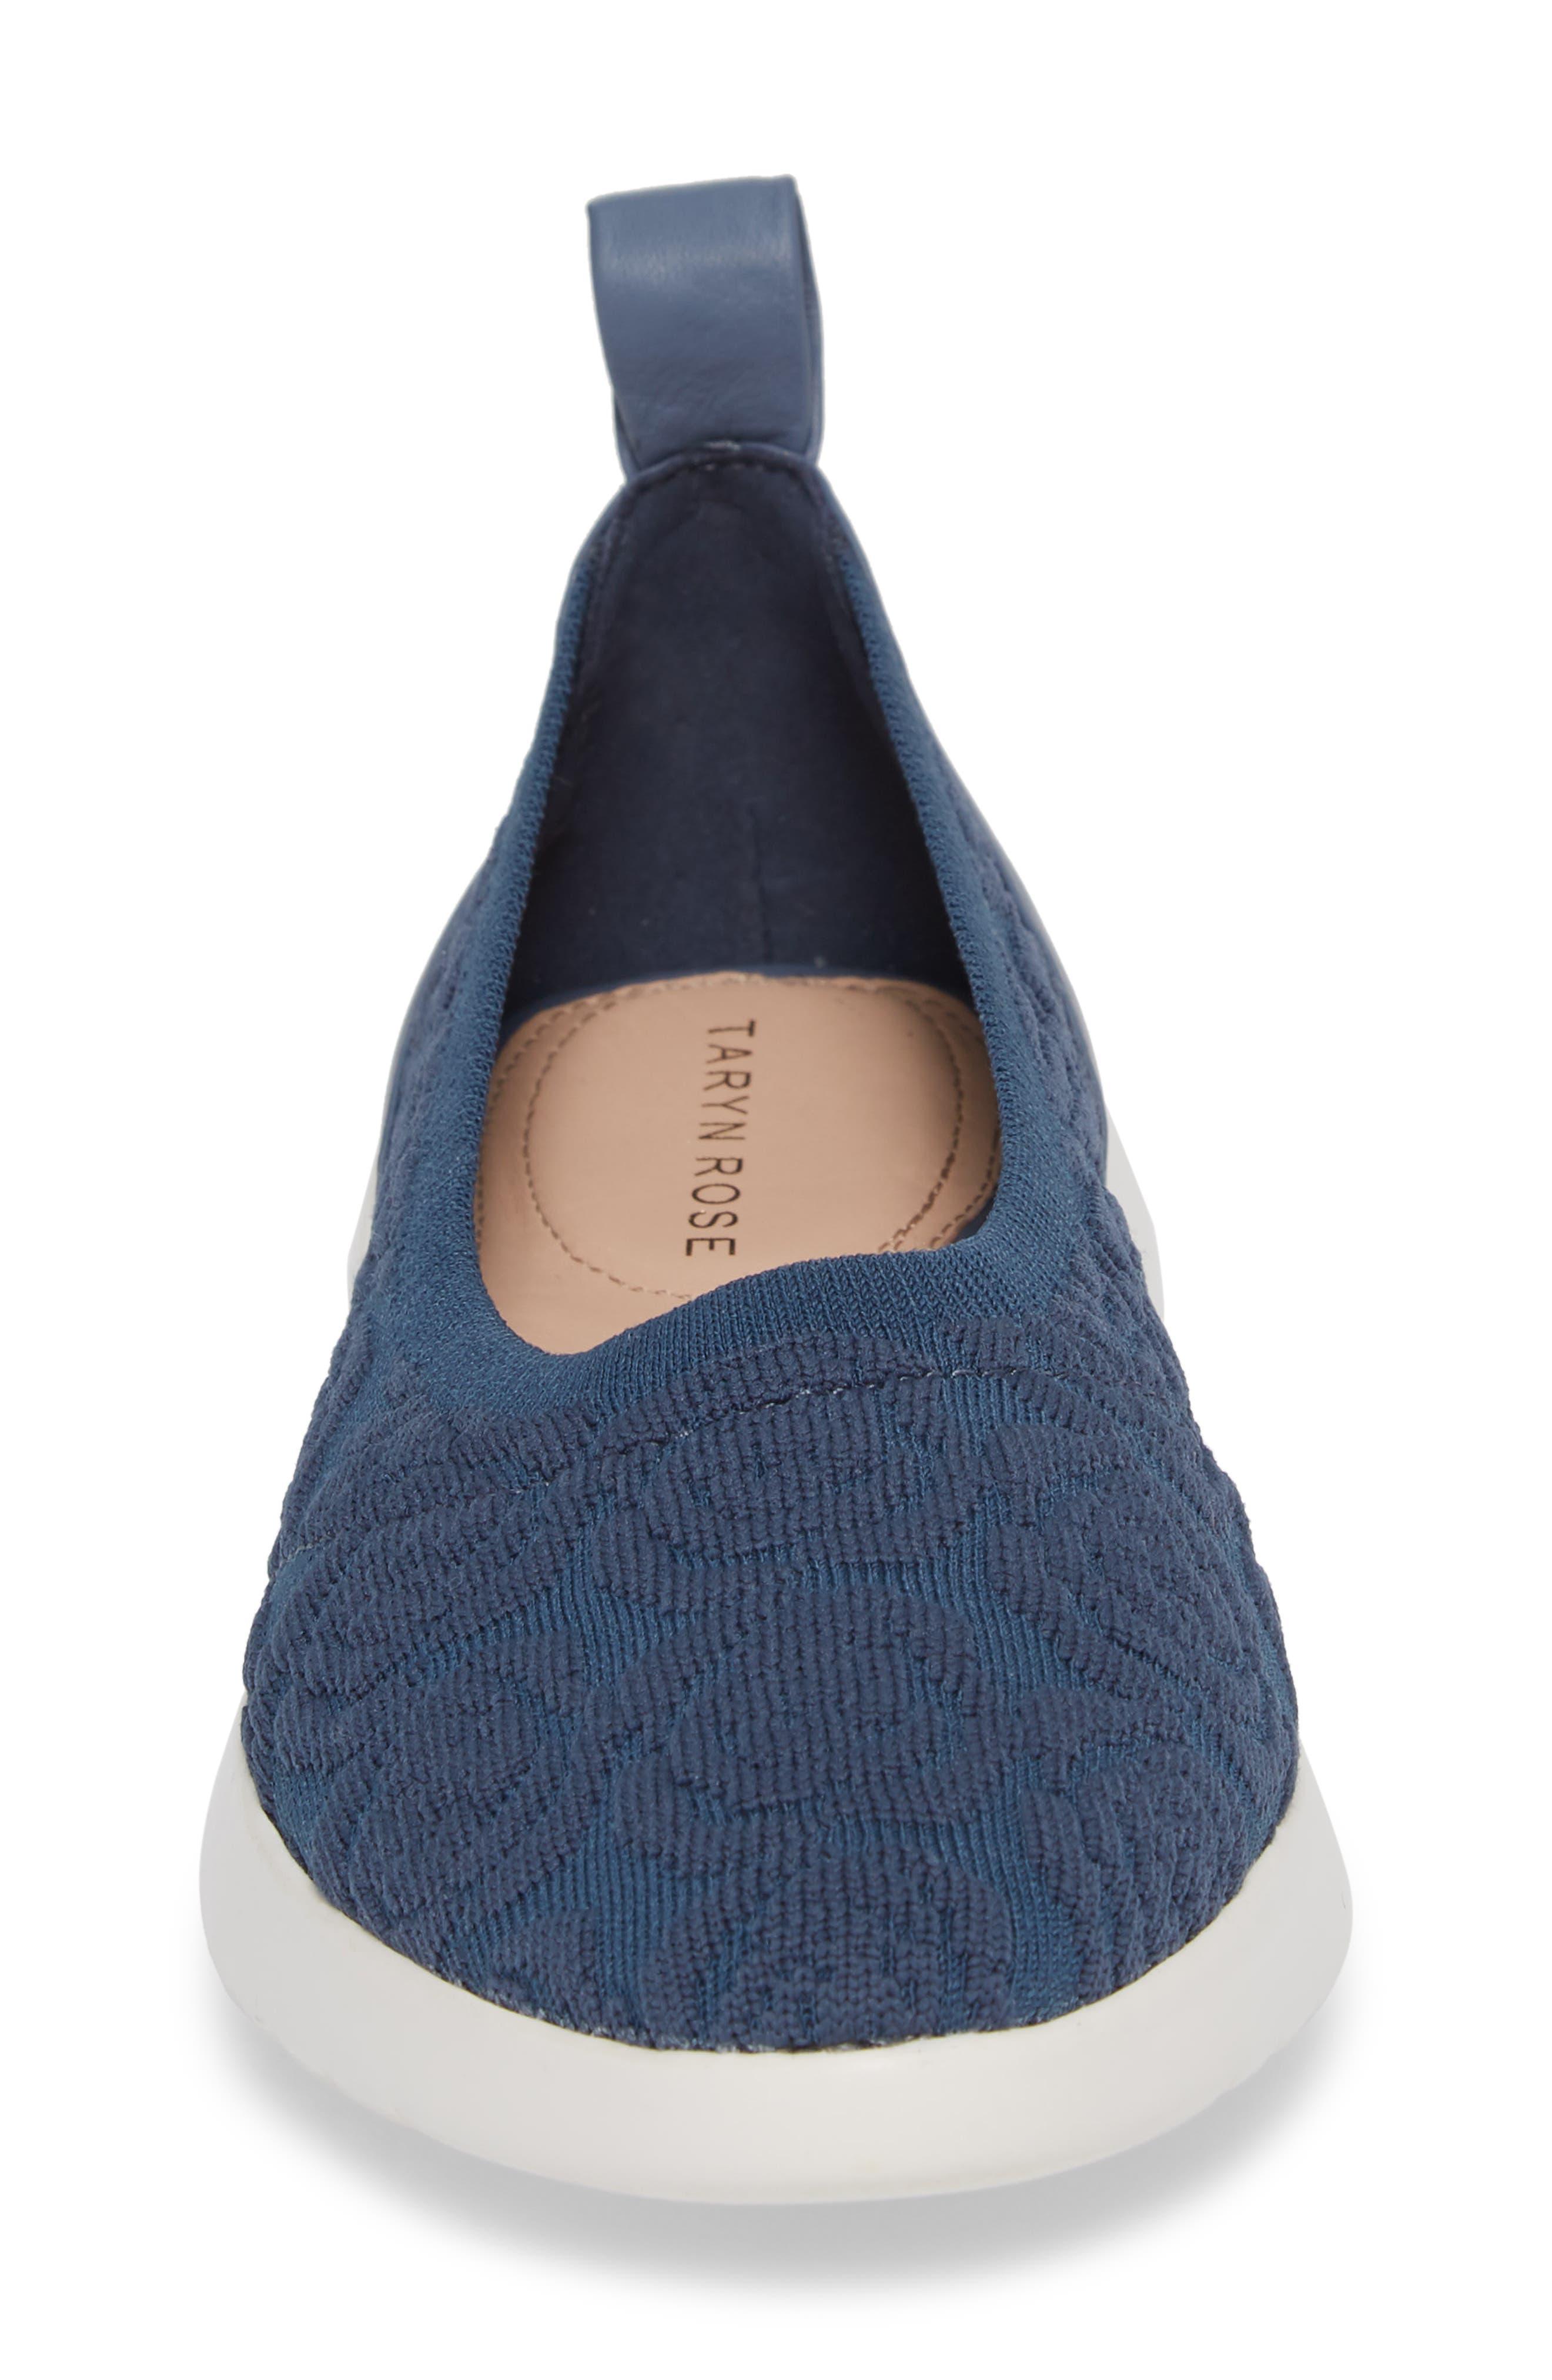 Daisy Flat,                             Alternate thumbnail 4, color,                             Denim Knit Fabric